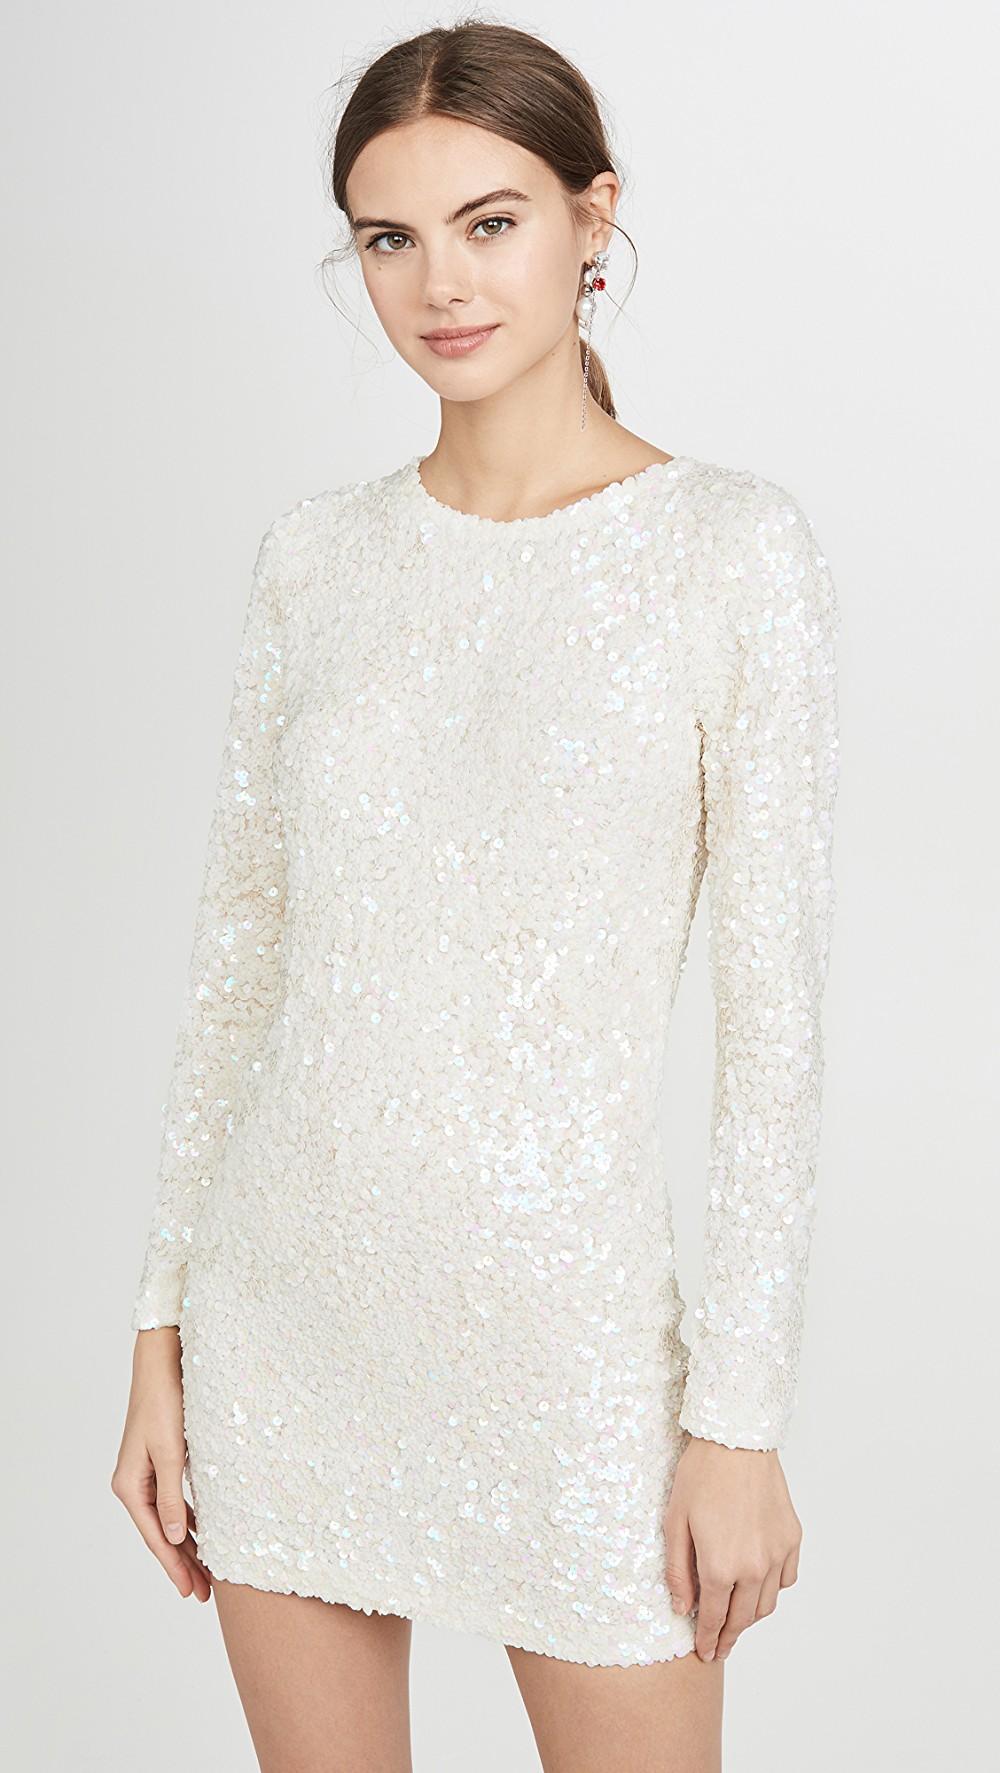 Ashish Sequin Long Sleeve Dress Long Sleeve Sequin Dress Long Sleeve Dress Sequin Mini Dress [ 1773 x 1000 Pixel ]